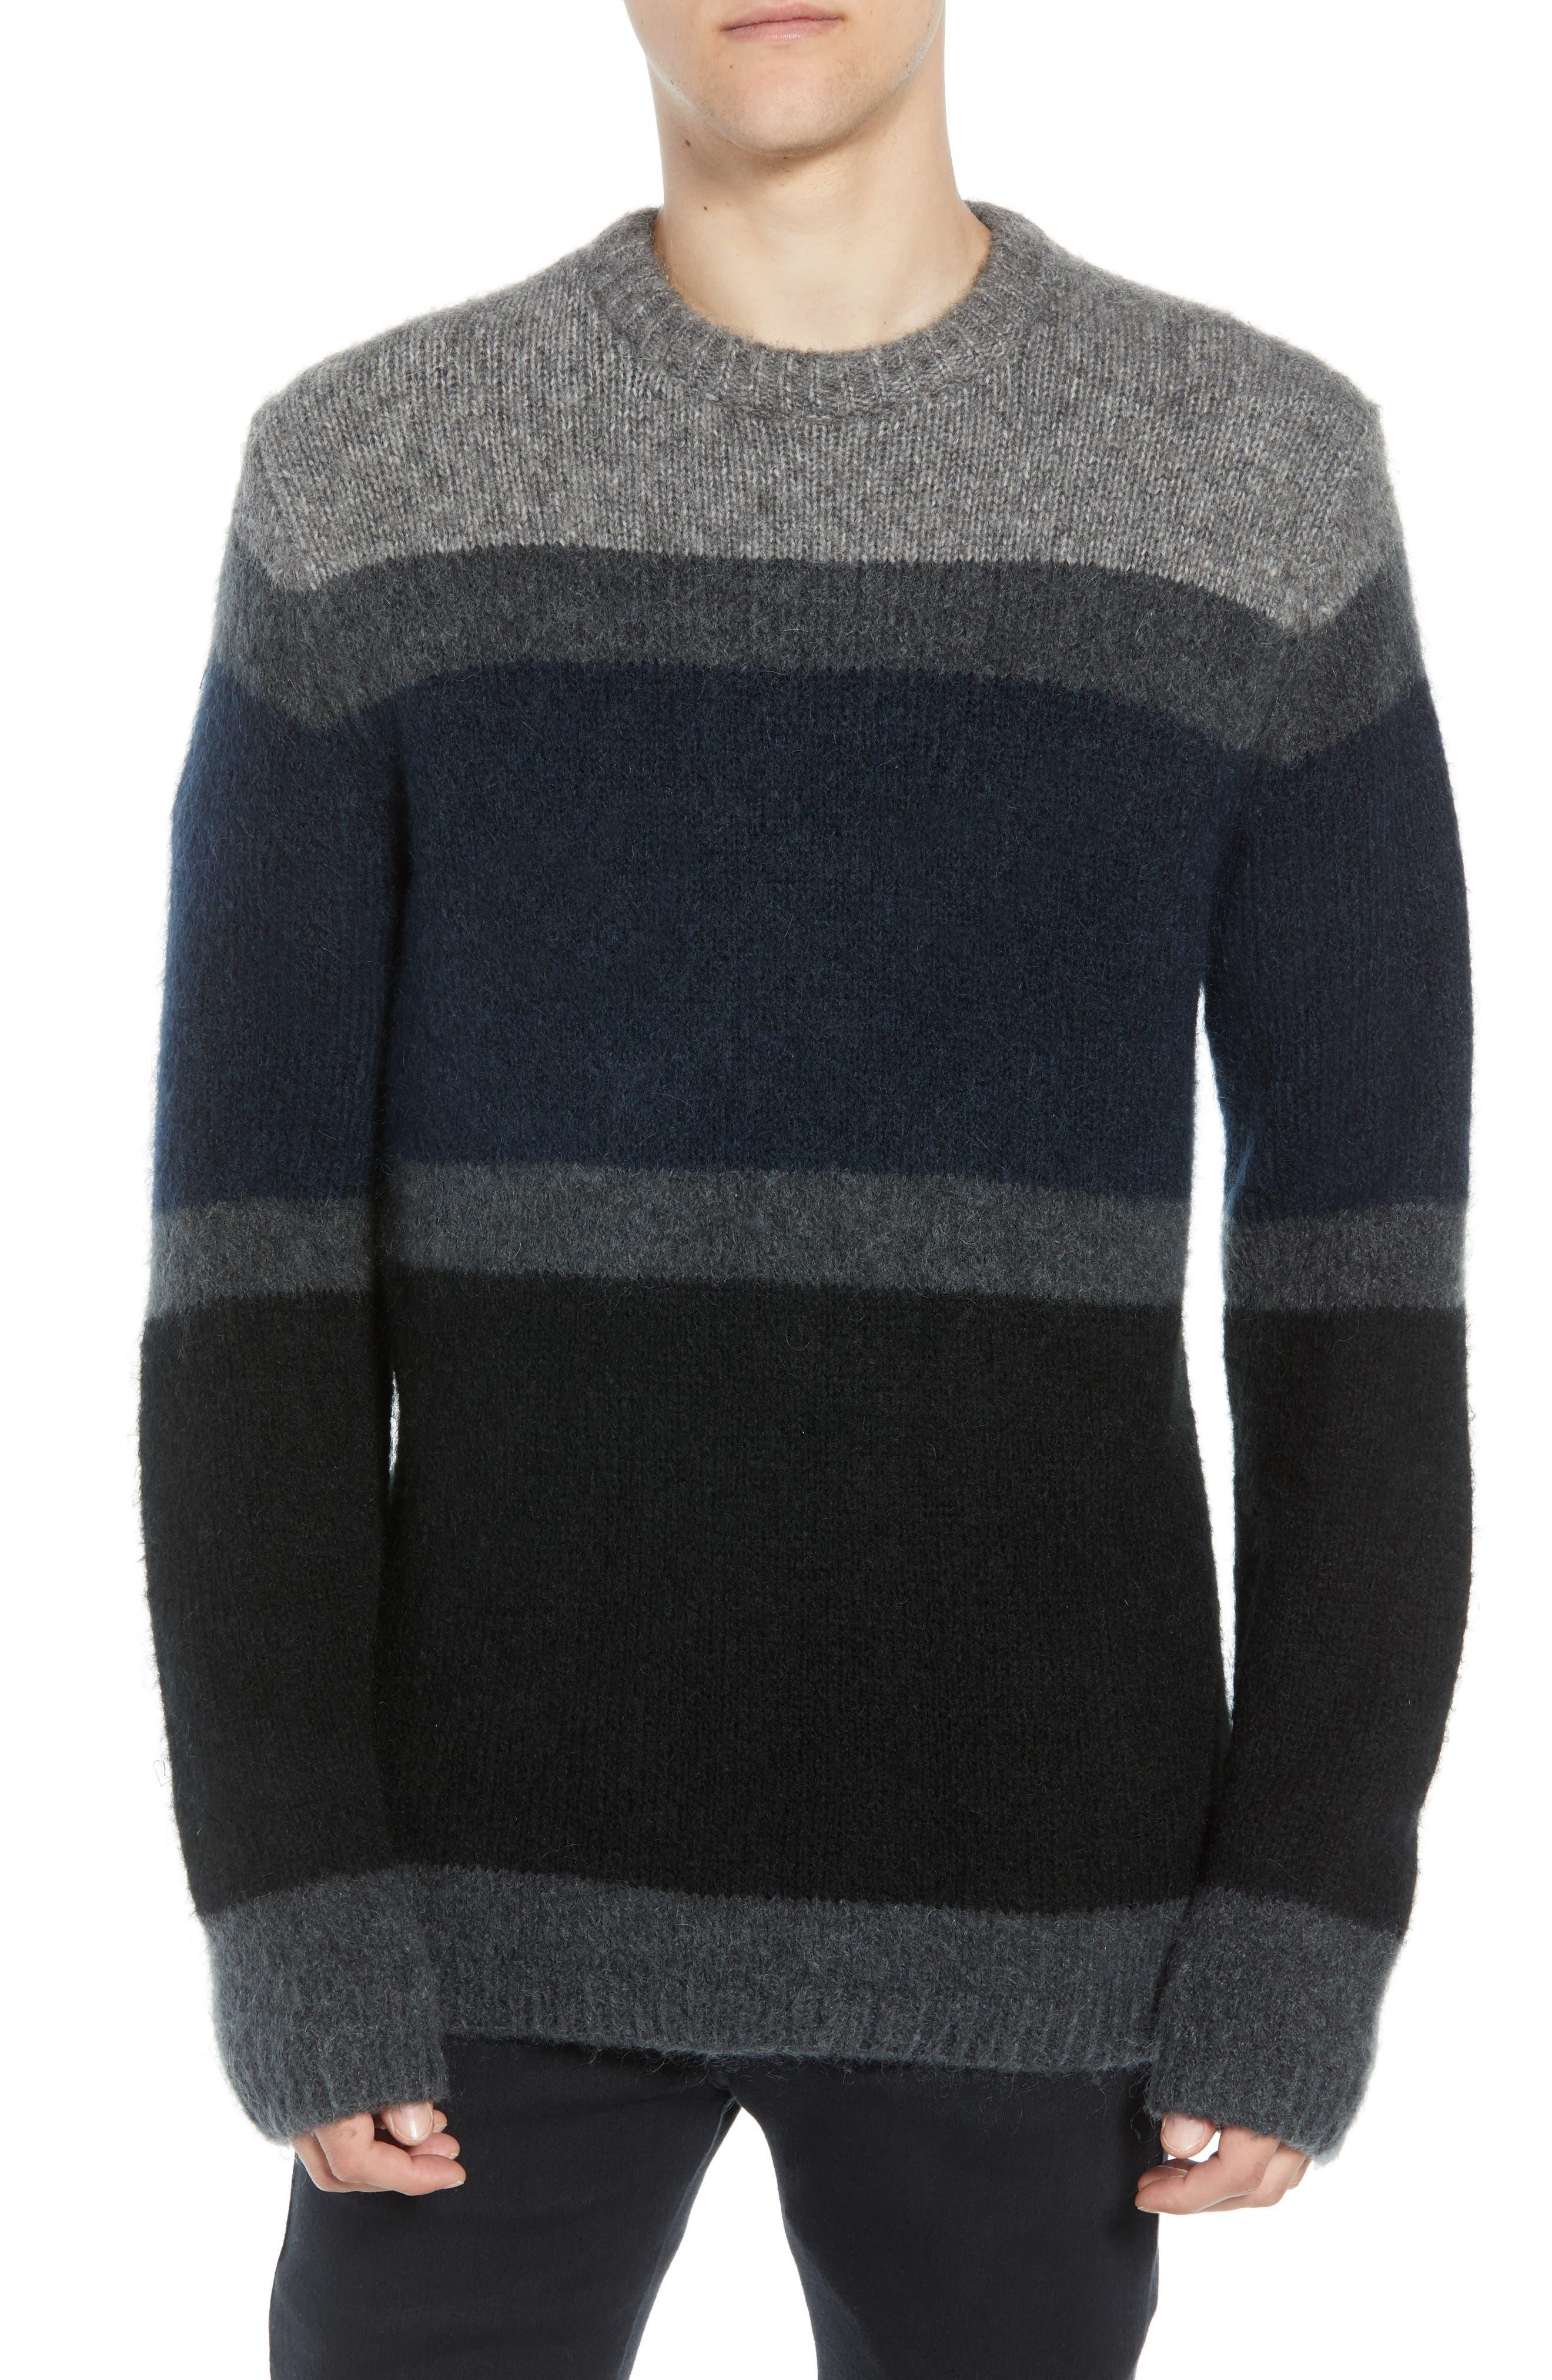 Stripe Sweater,                             Main thumbnail 1, color,                             UTILITY BLUE CHARCOAL MELANGE